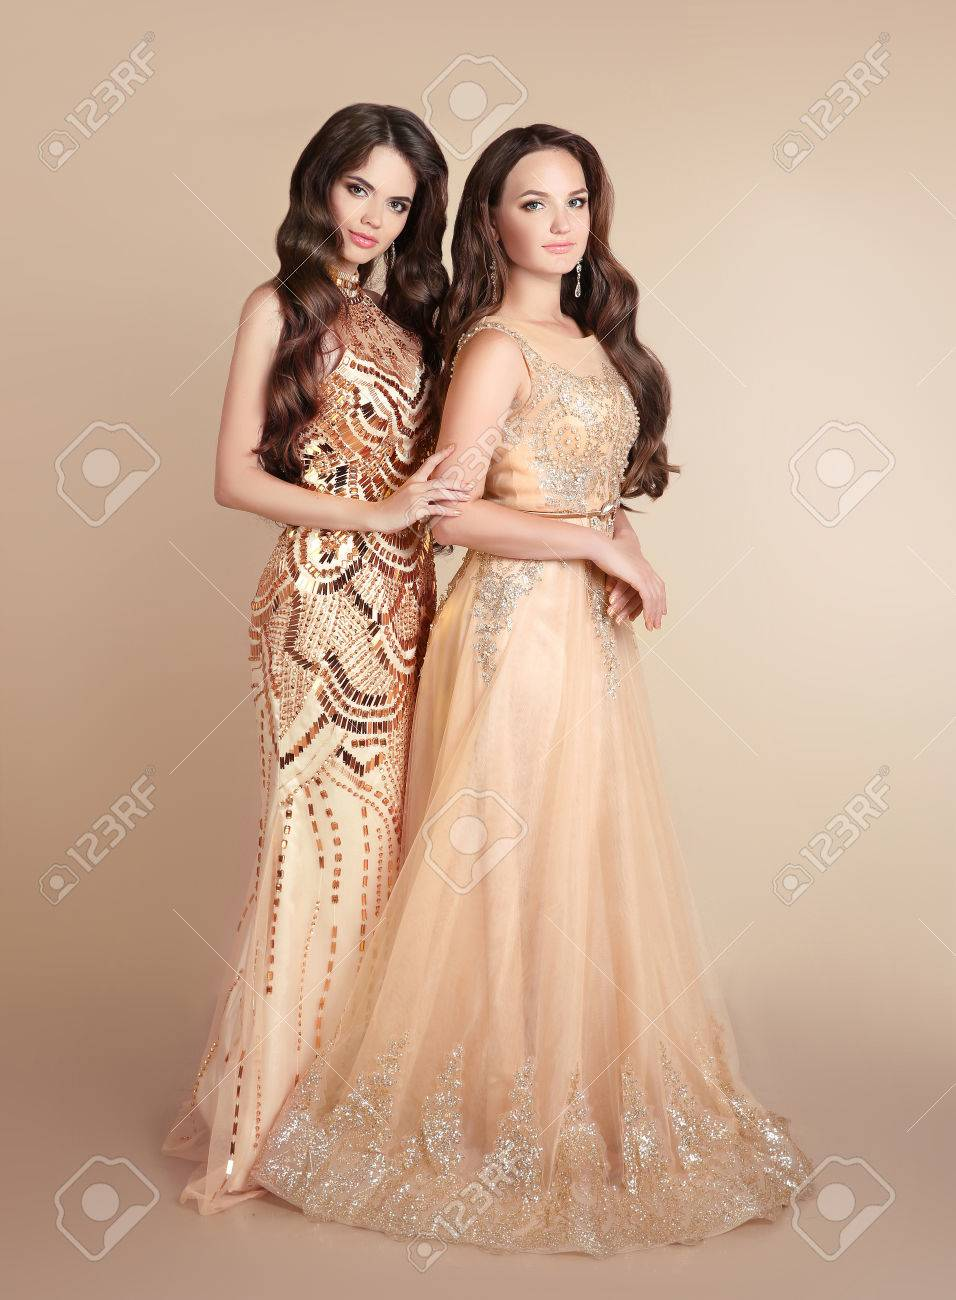 Mooie Kleding Dames.Twee Mode Dames Mooie Vrouwen Met Golvend Haar Draagt In Lange